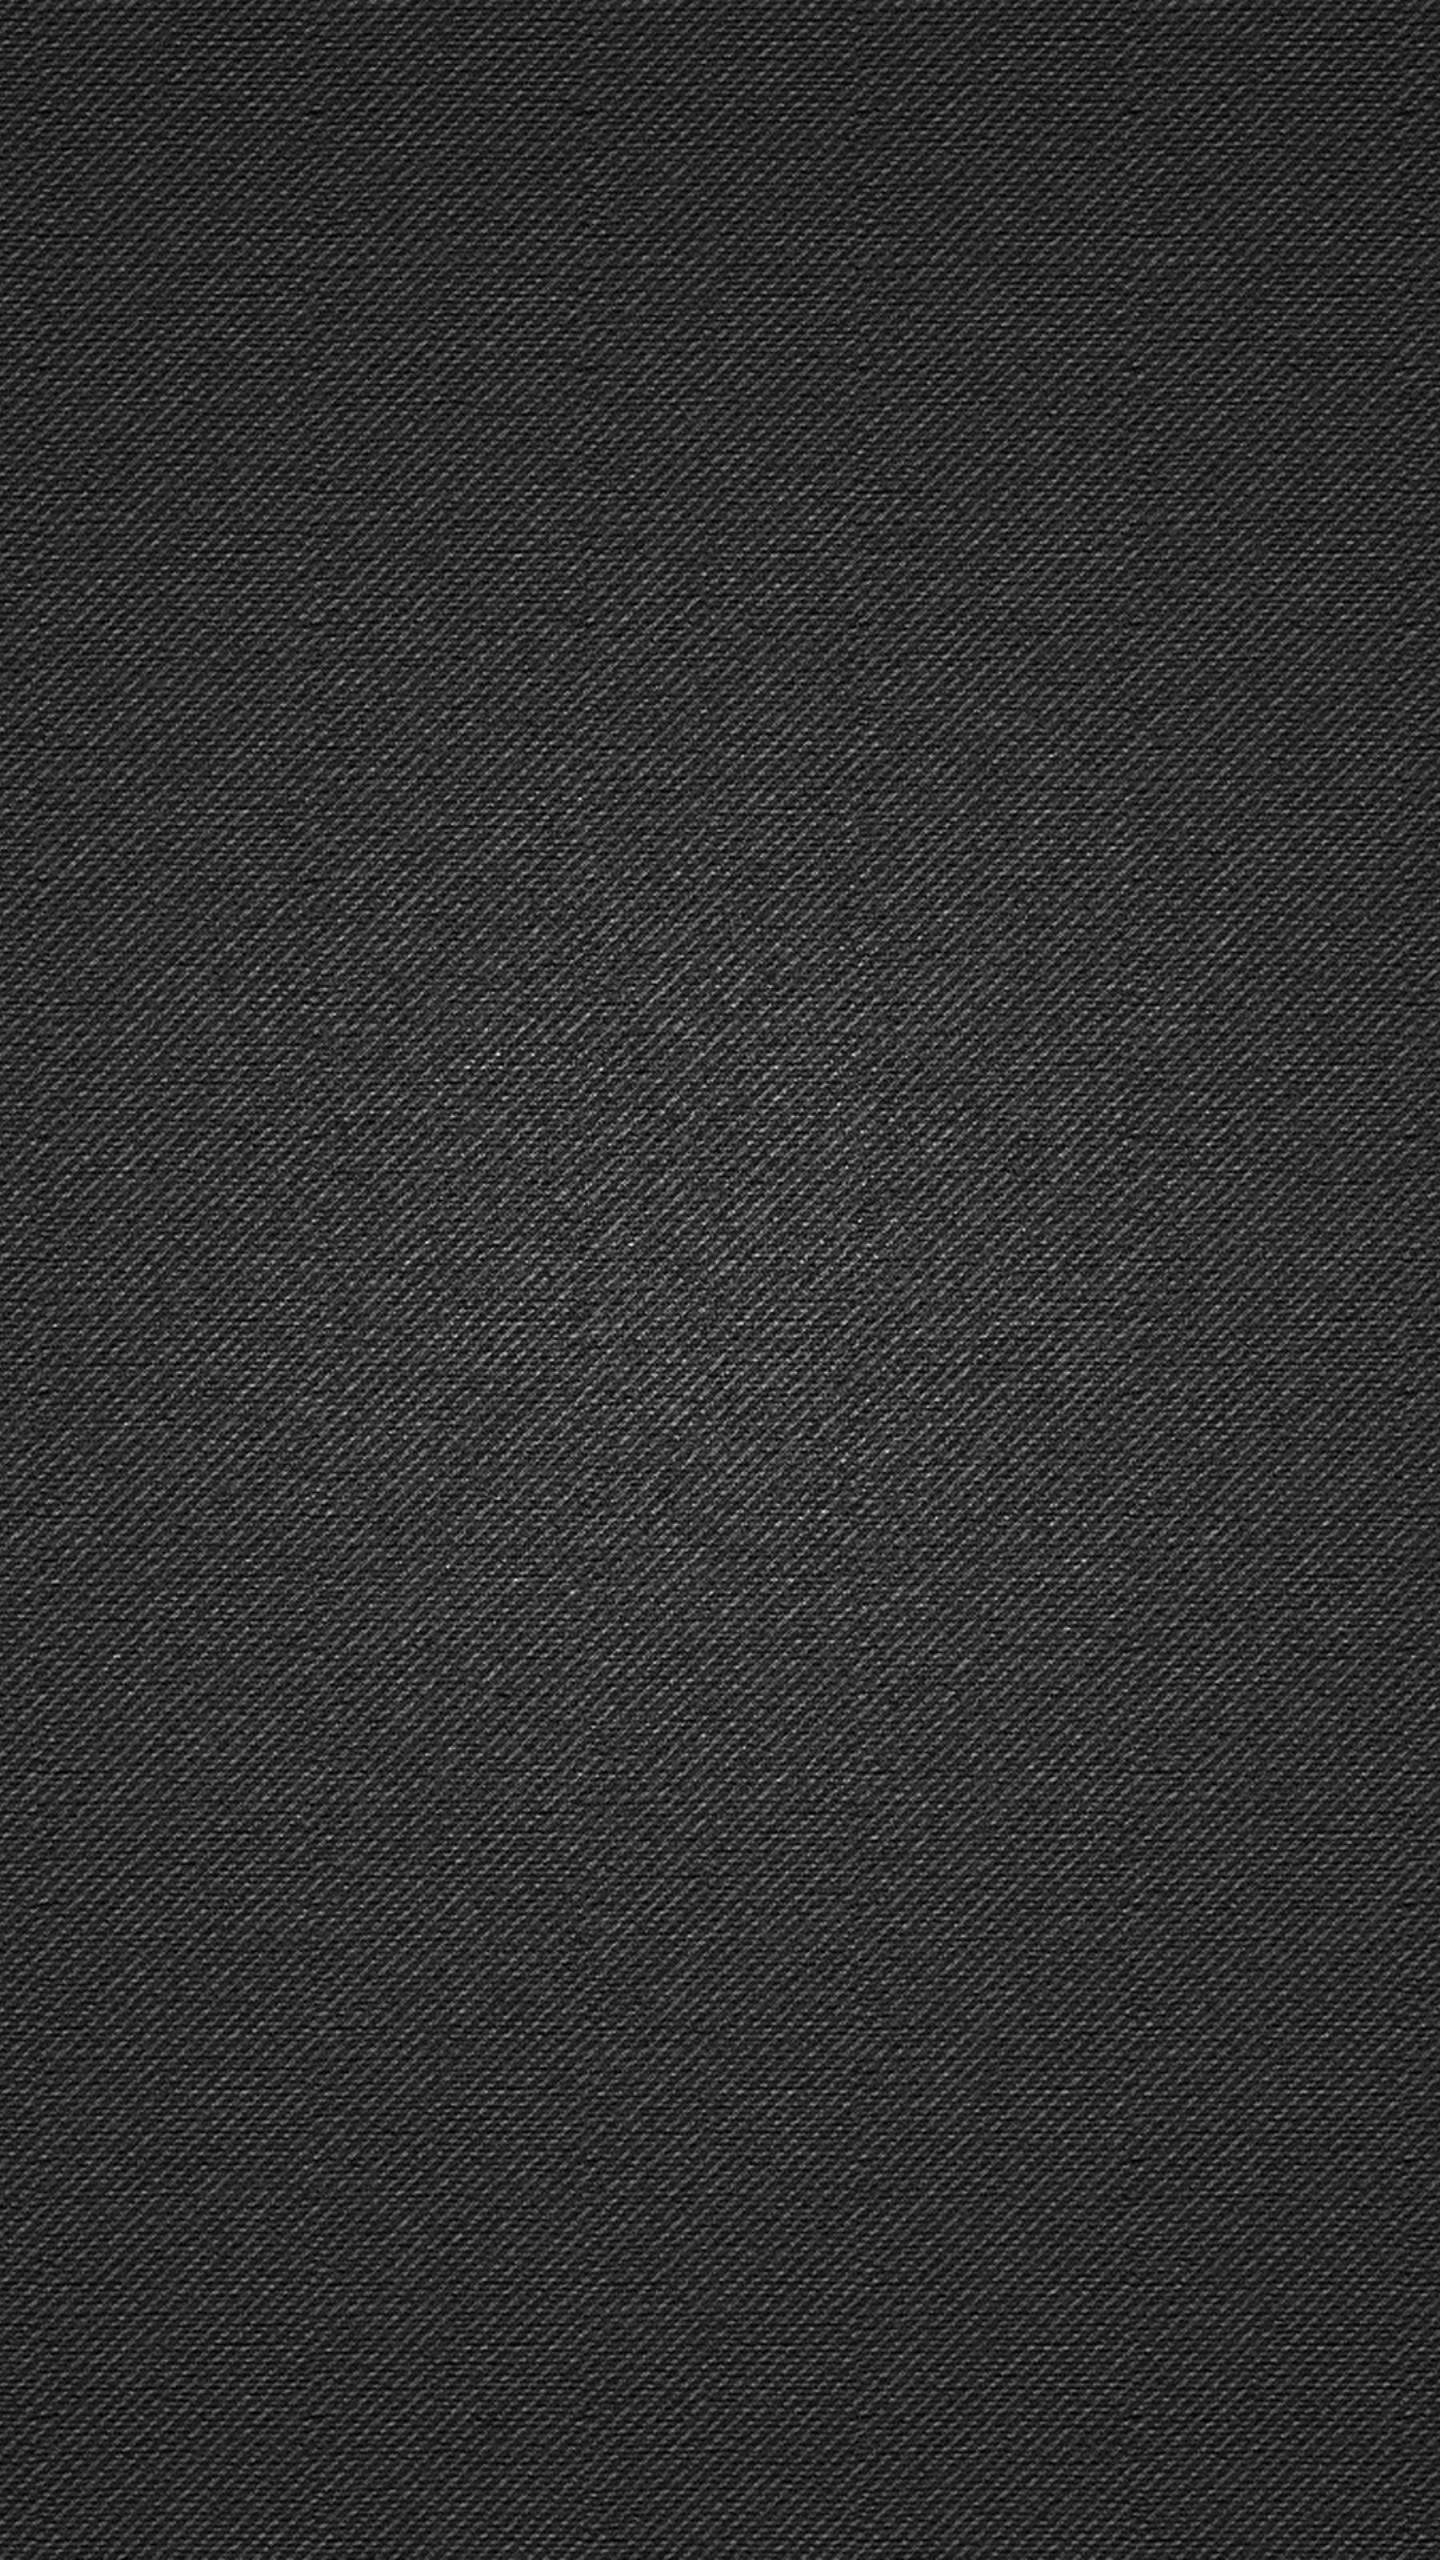 Motorola Wallpapers 1